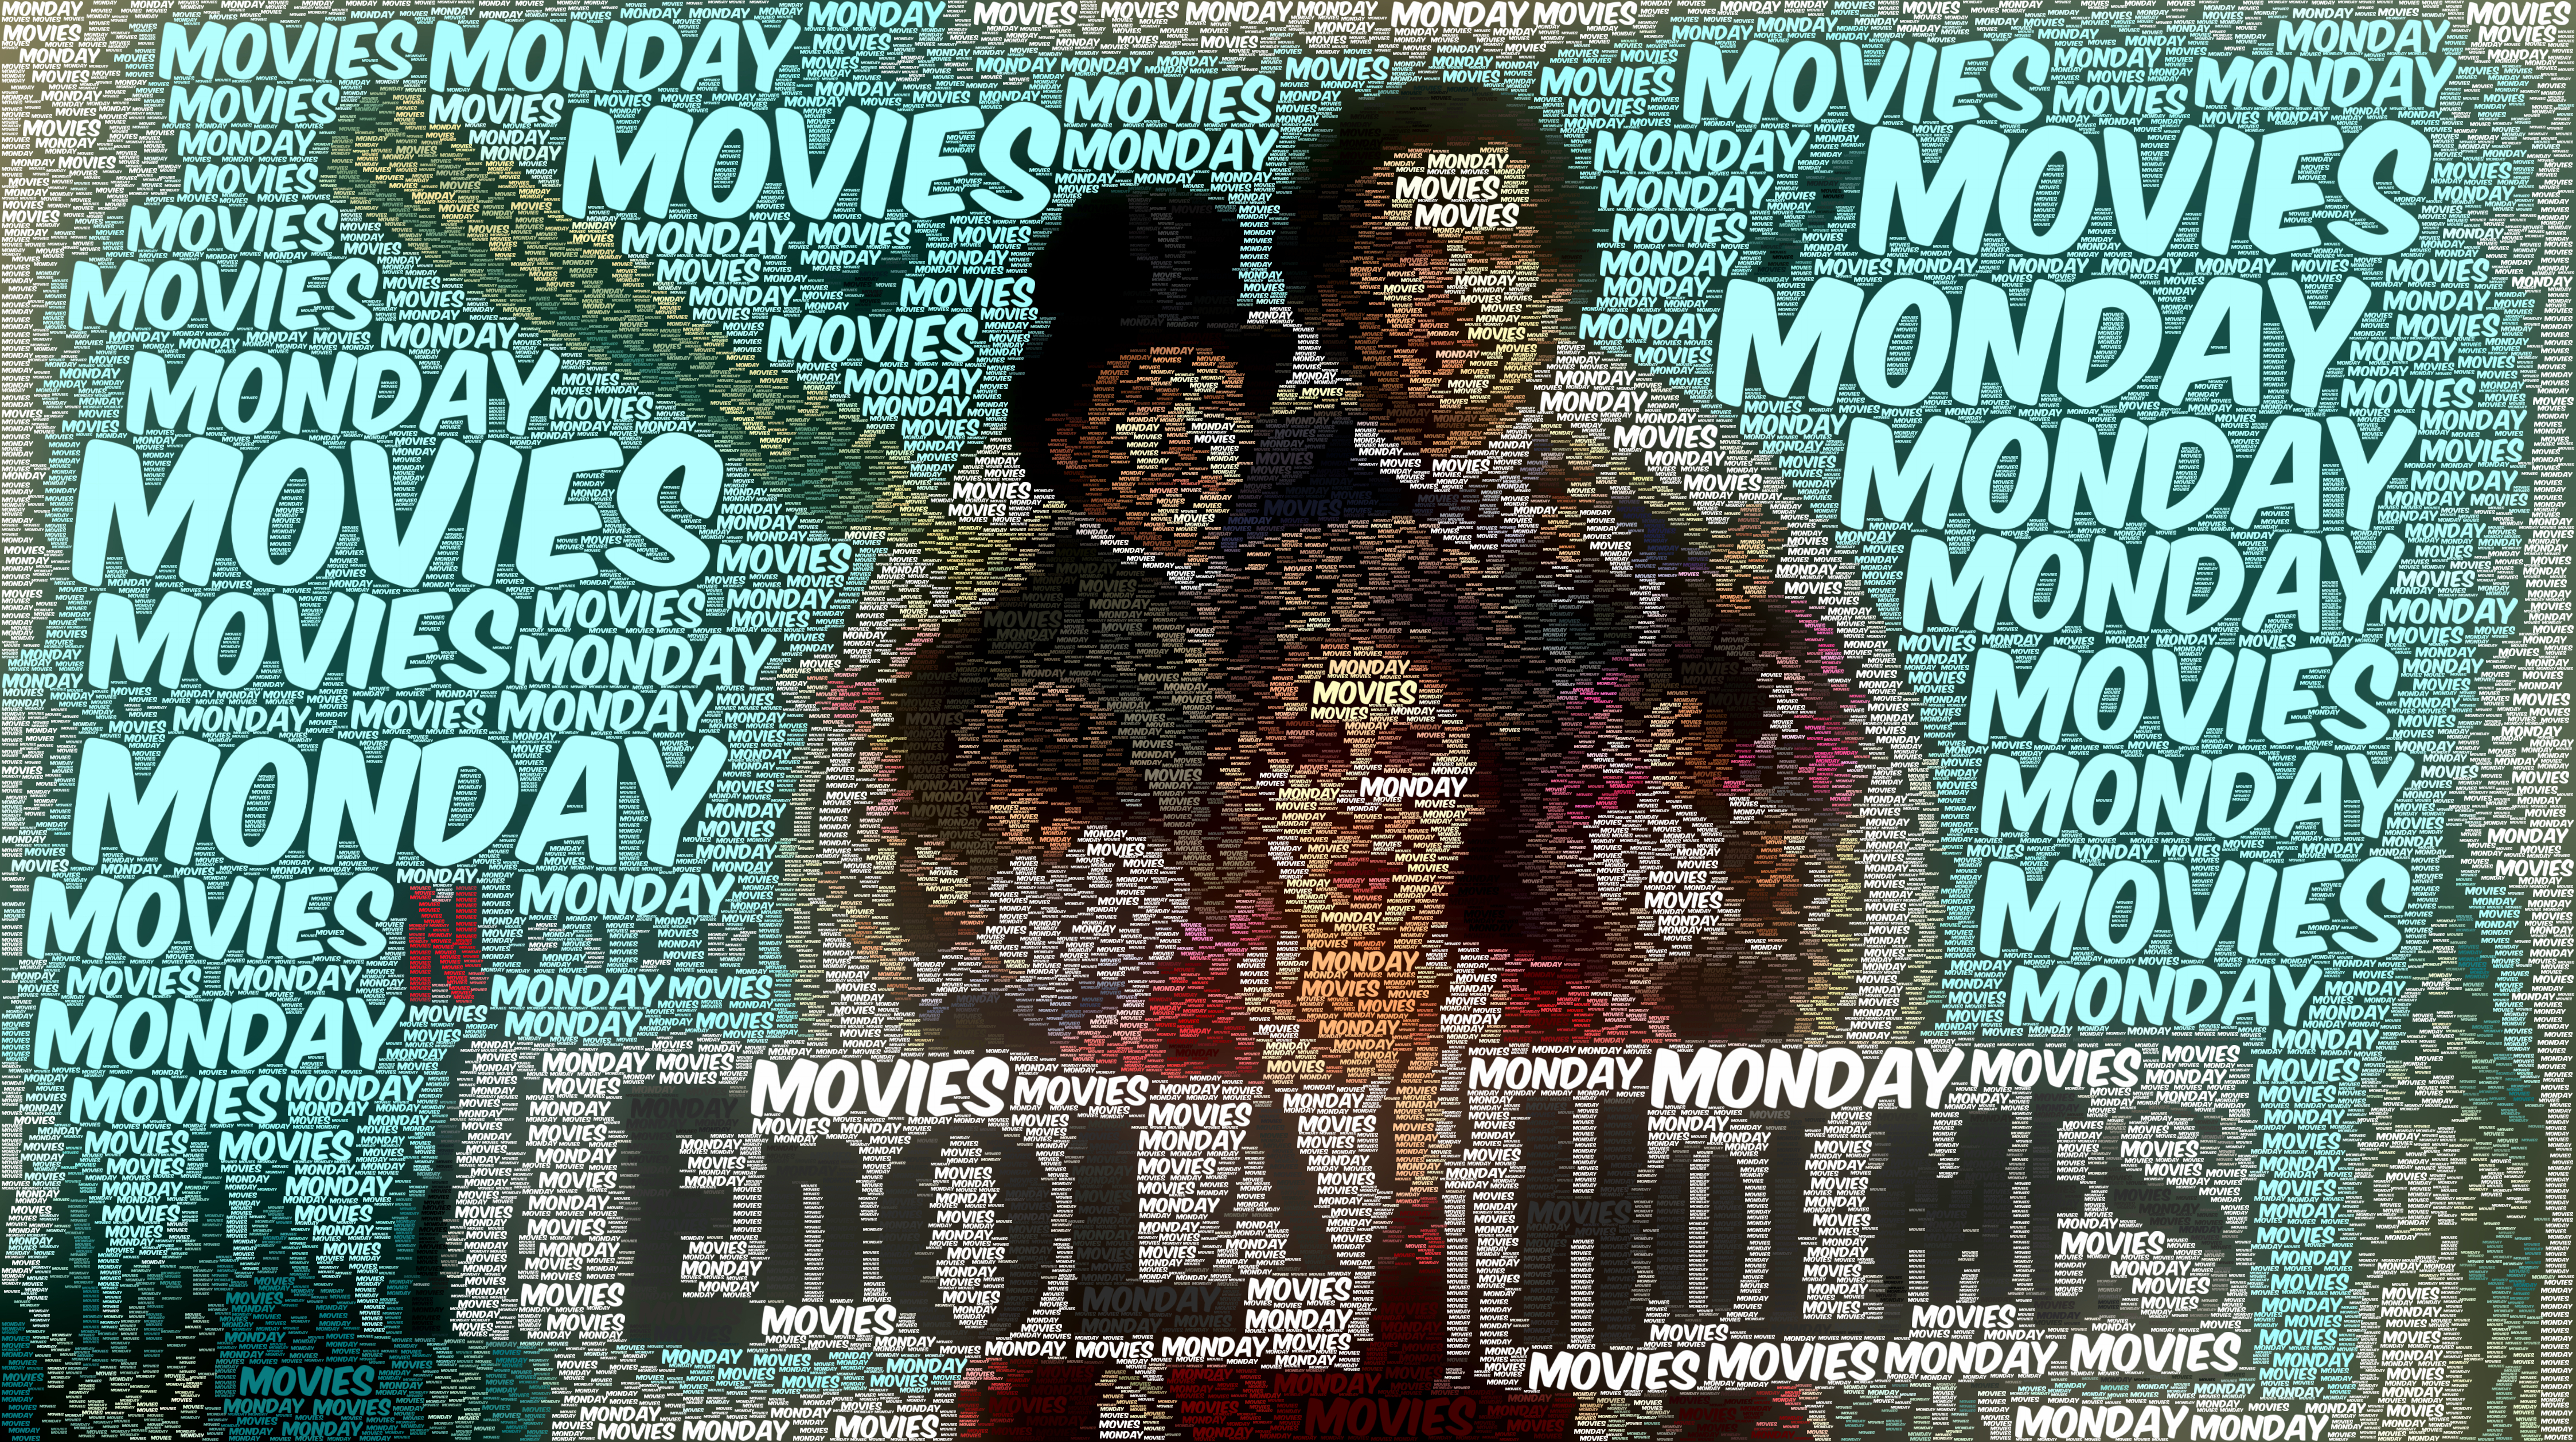 Monday Movies ~ 28/09/2020